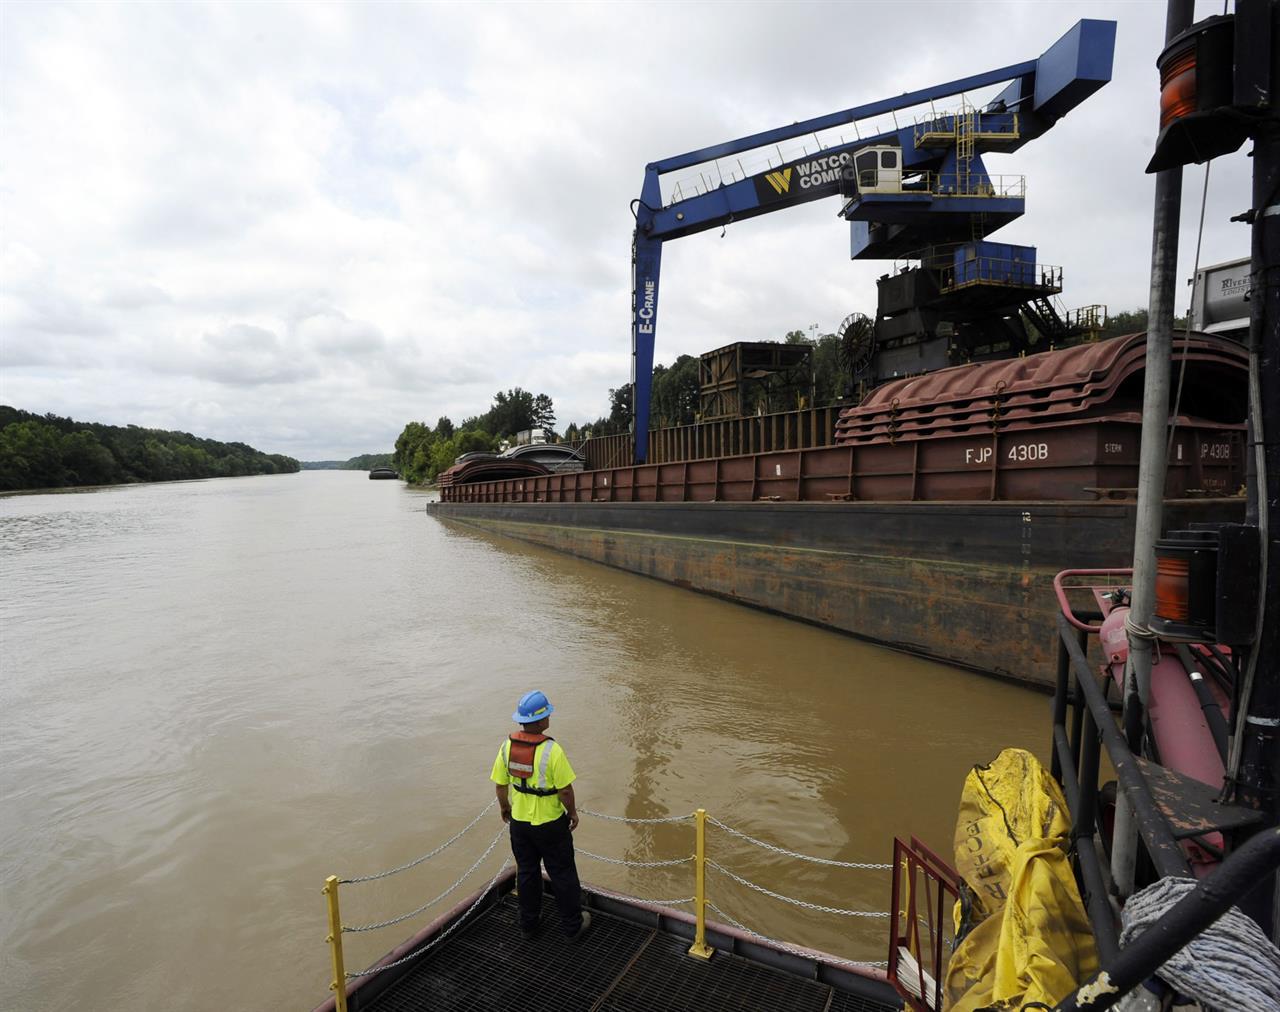 $2B waterway through Deep South yet to yield promised boom